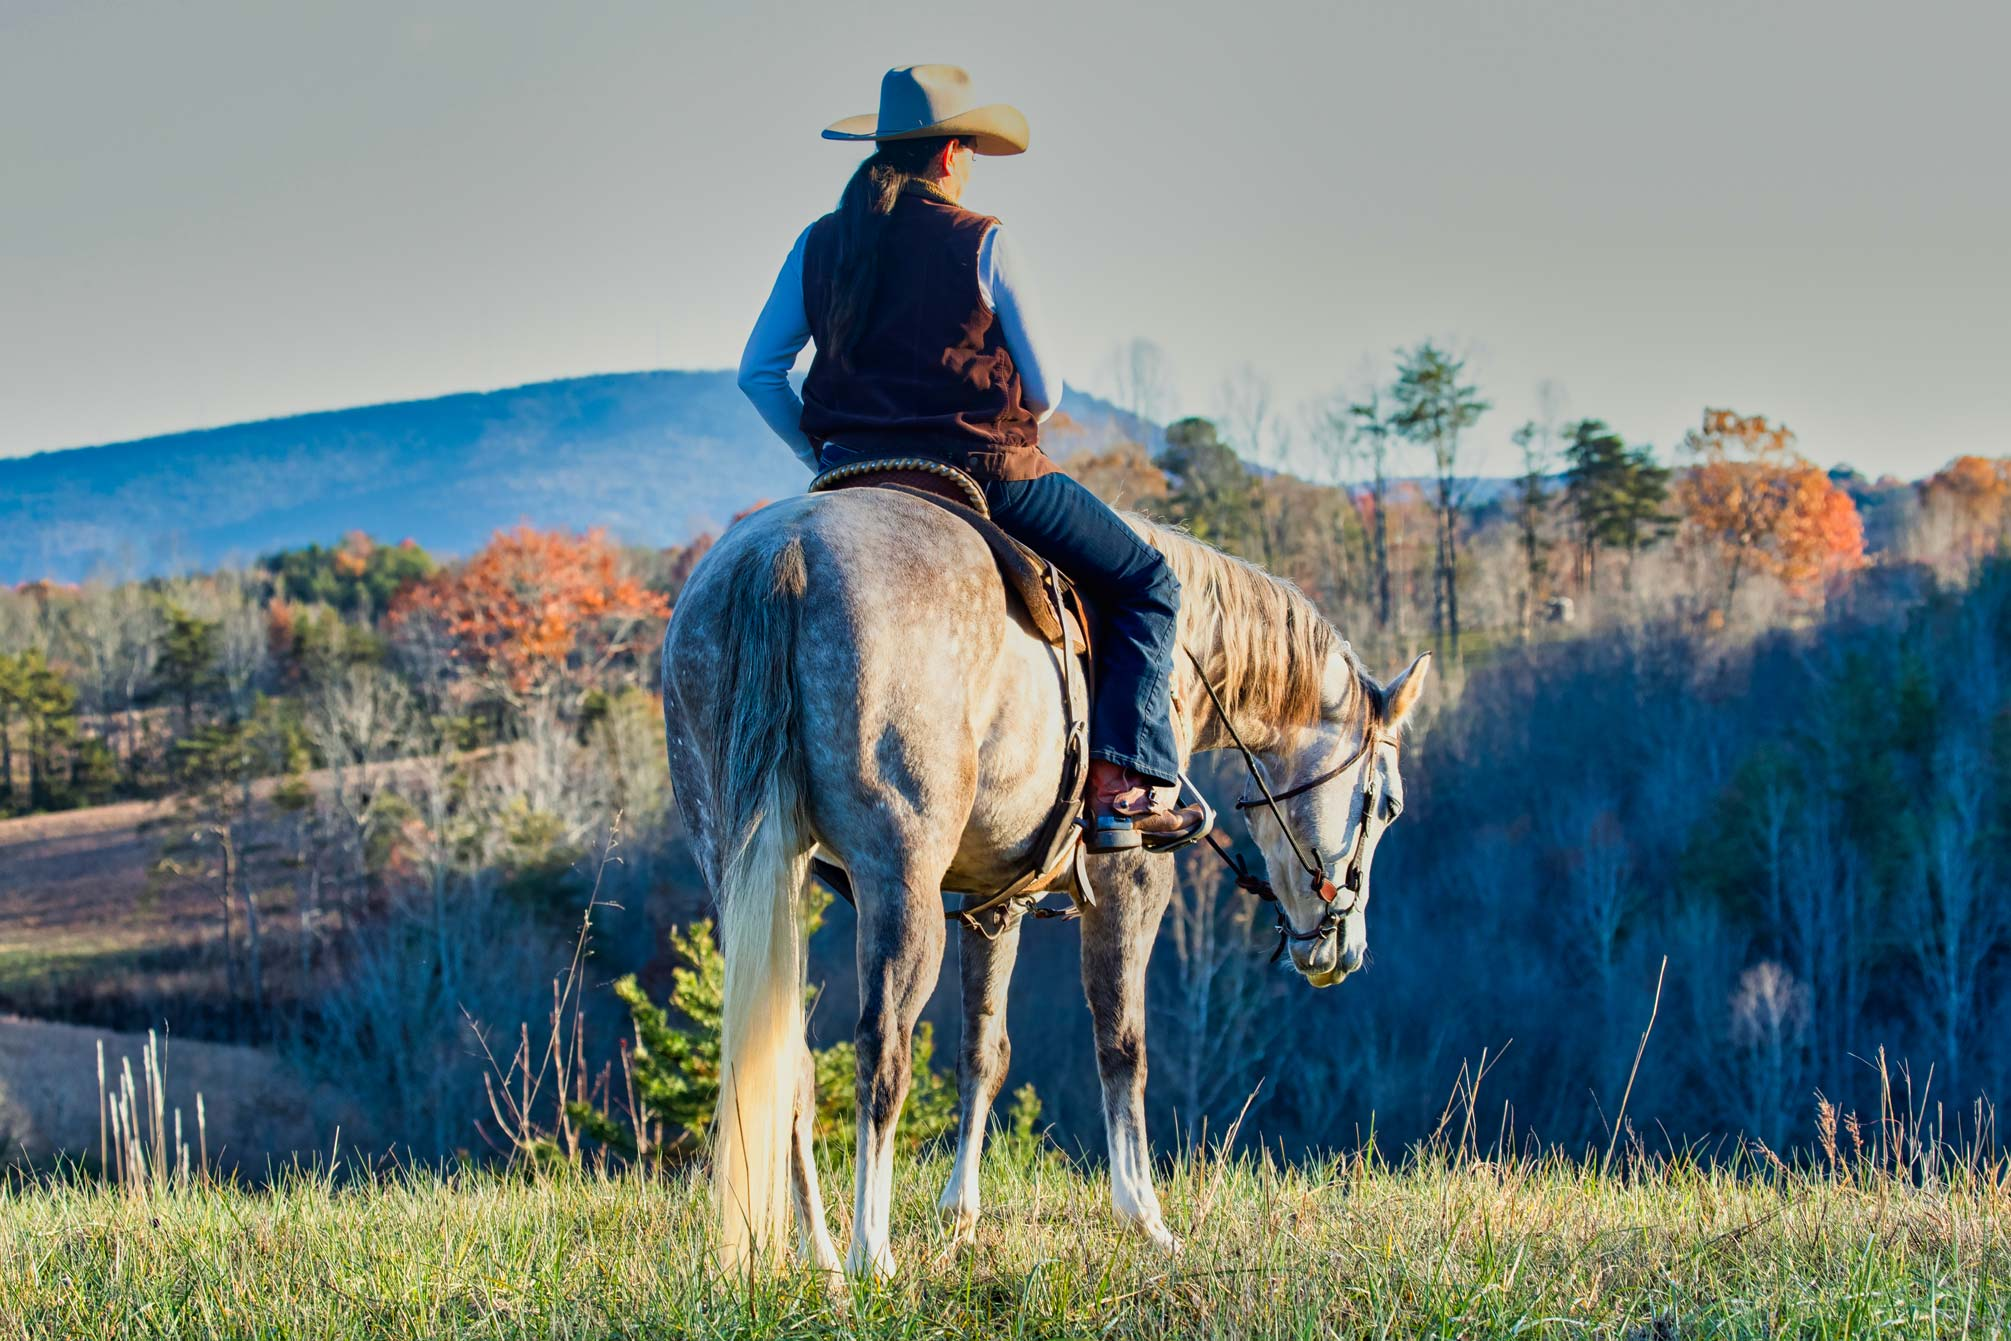 Rawhide-Ranch-Traveler_59I2446